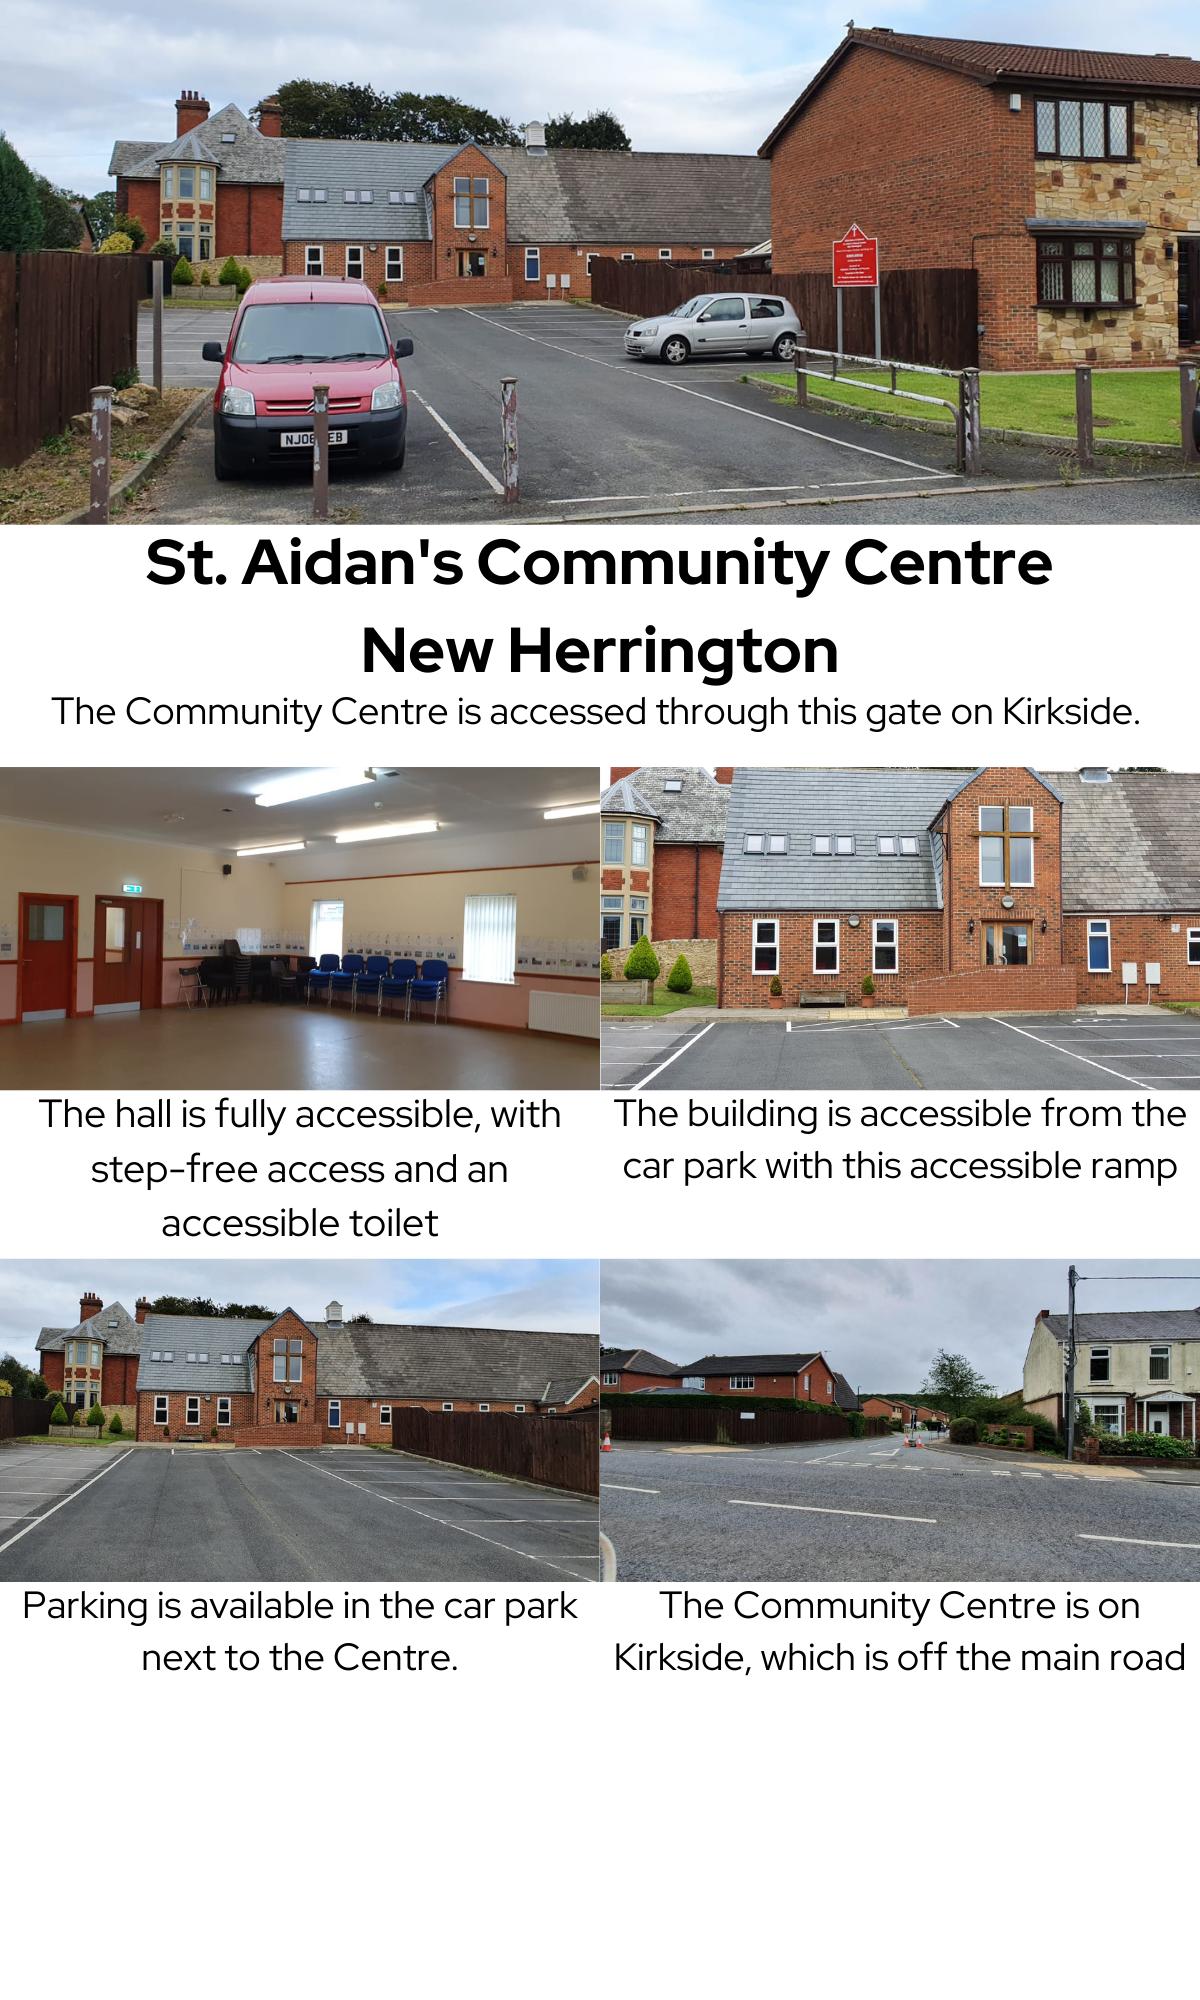 St. Aidan's Information Sheet